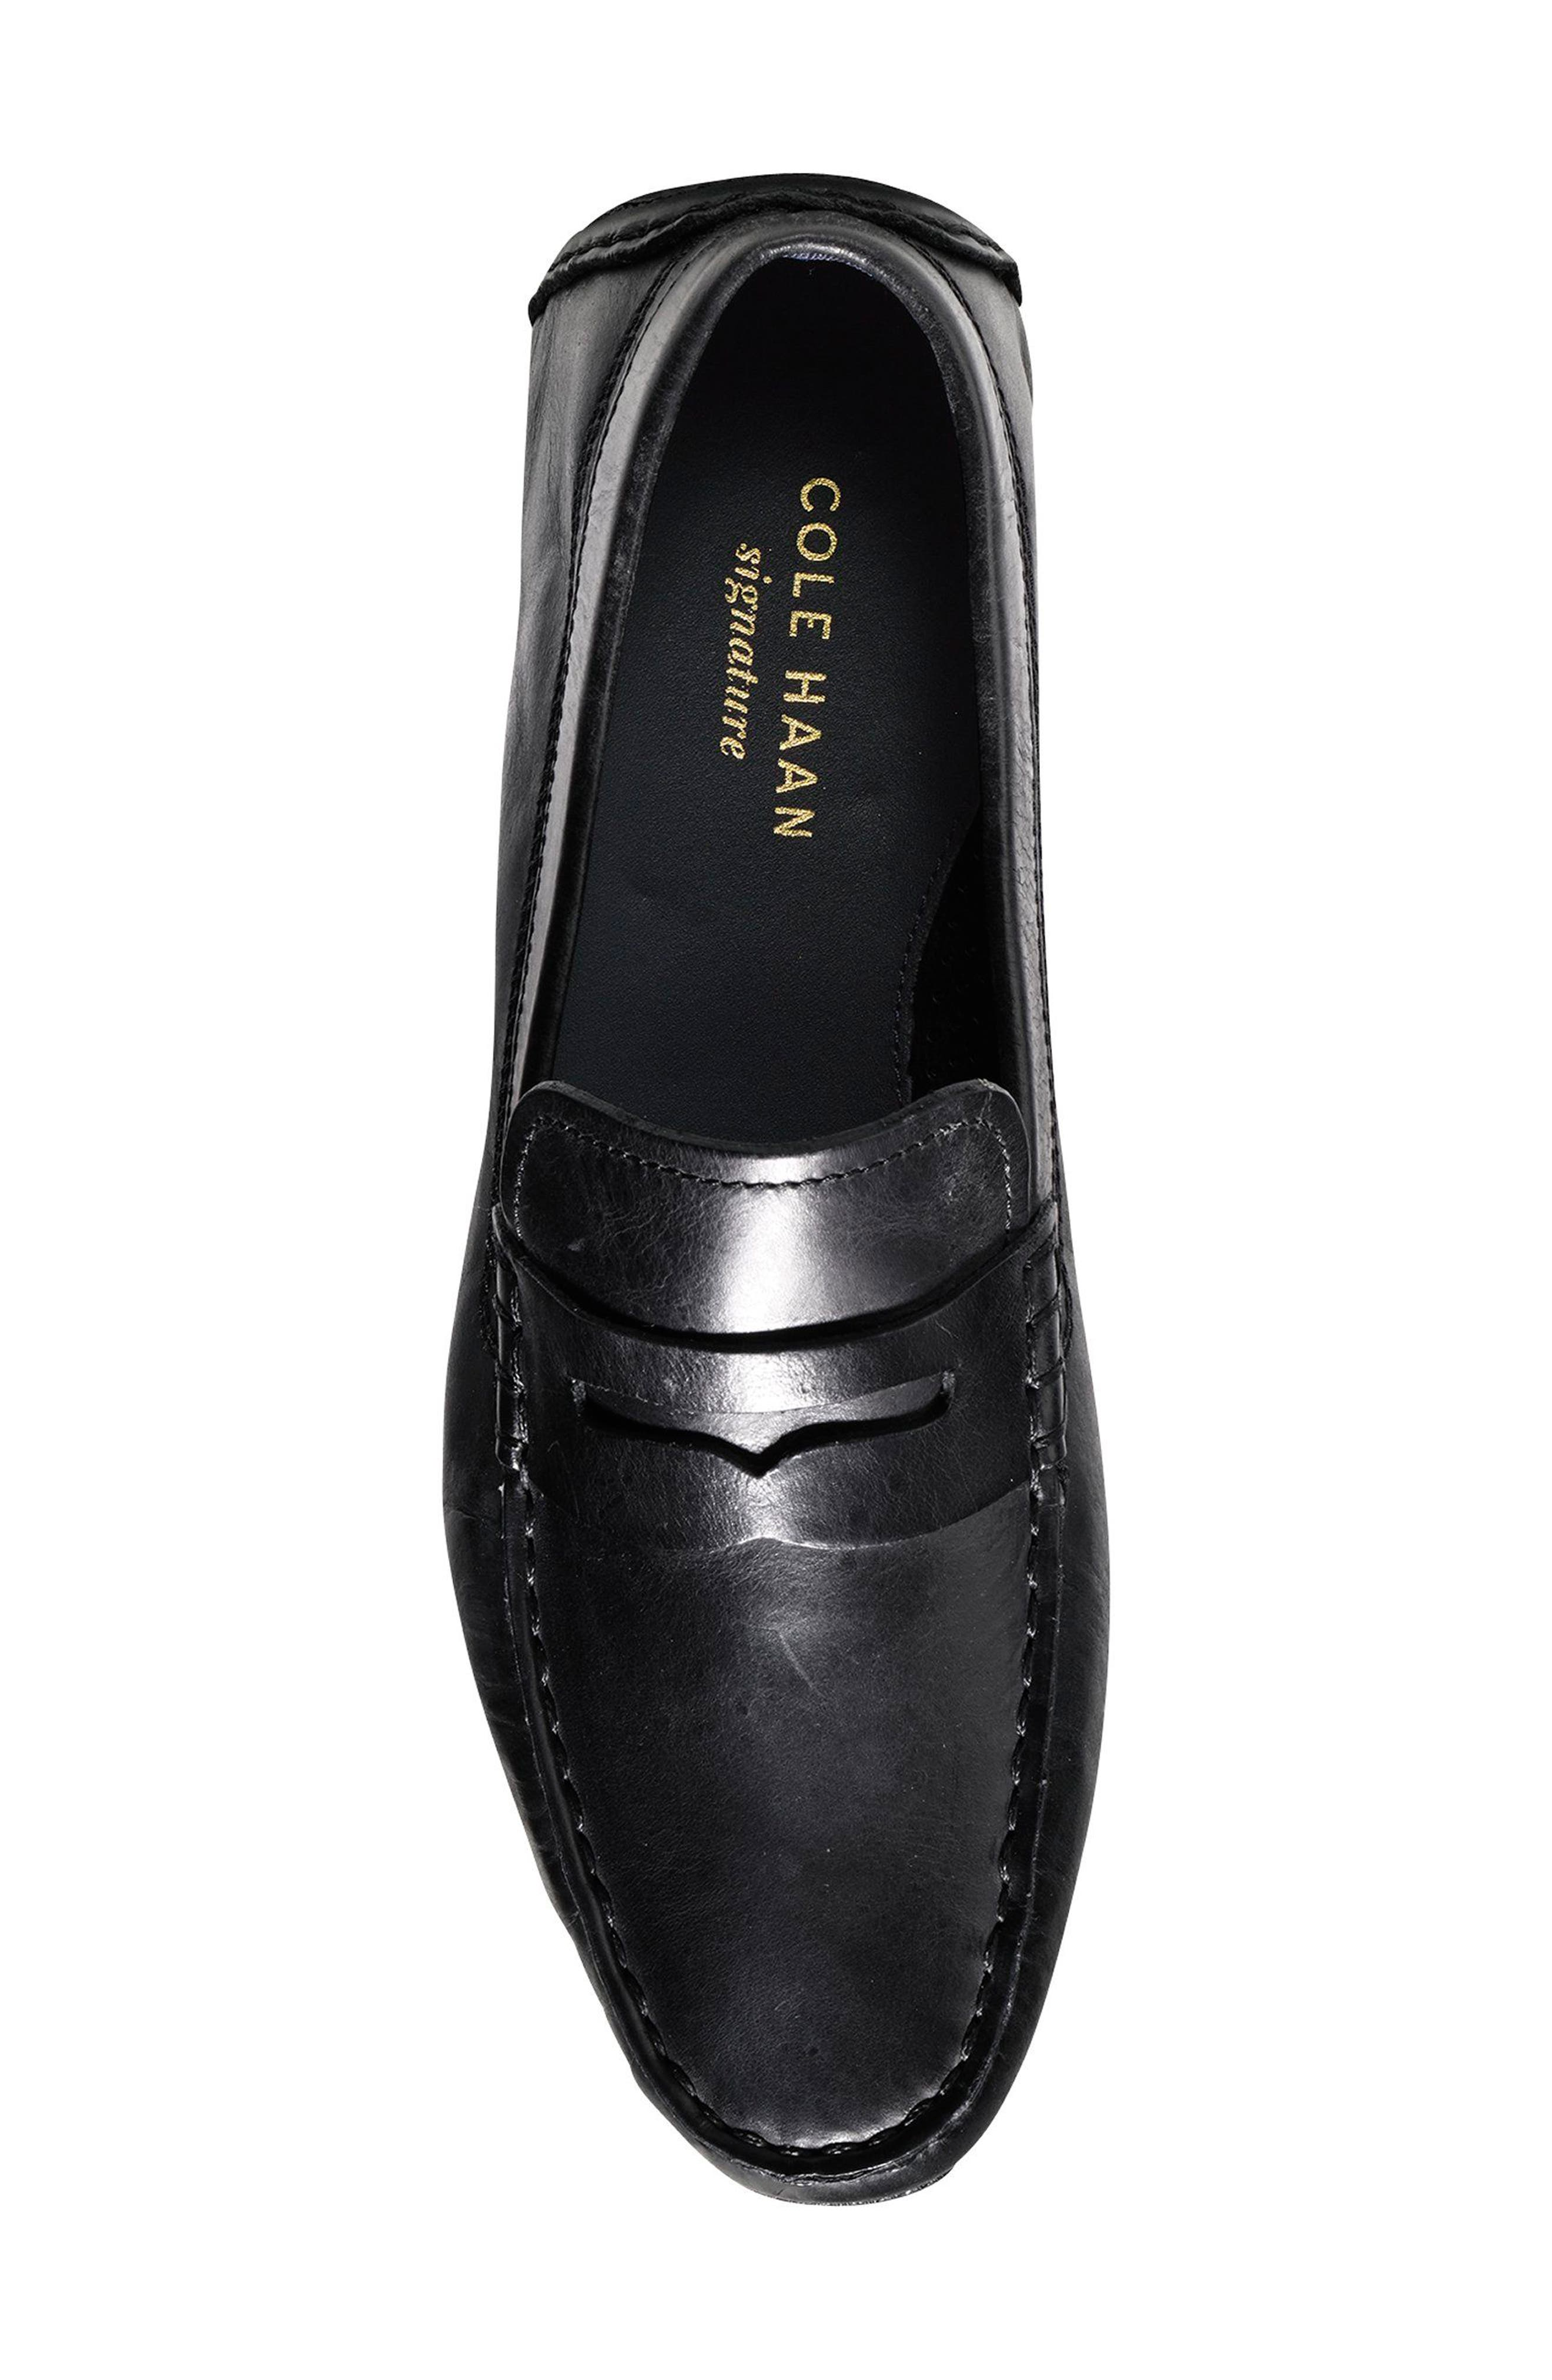 Kelson Driving Shoe,                             Alternate thumbnail 4, color,                             Black